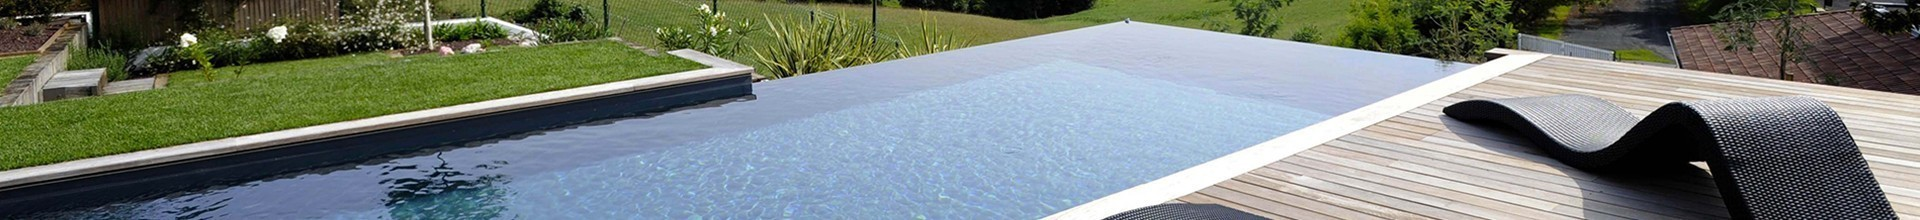 Direct usine, piscine coque prix Louvain